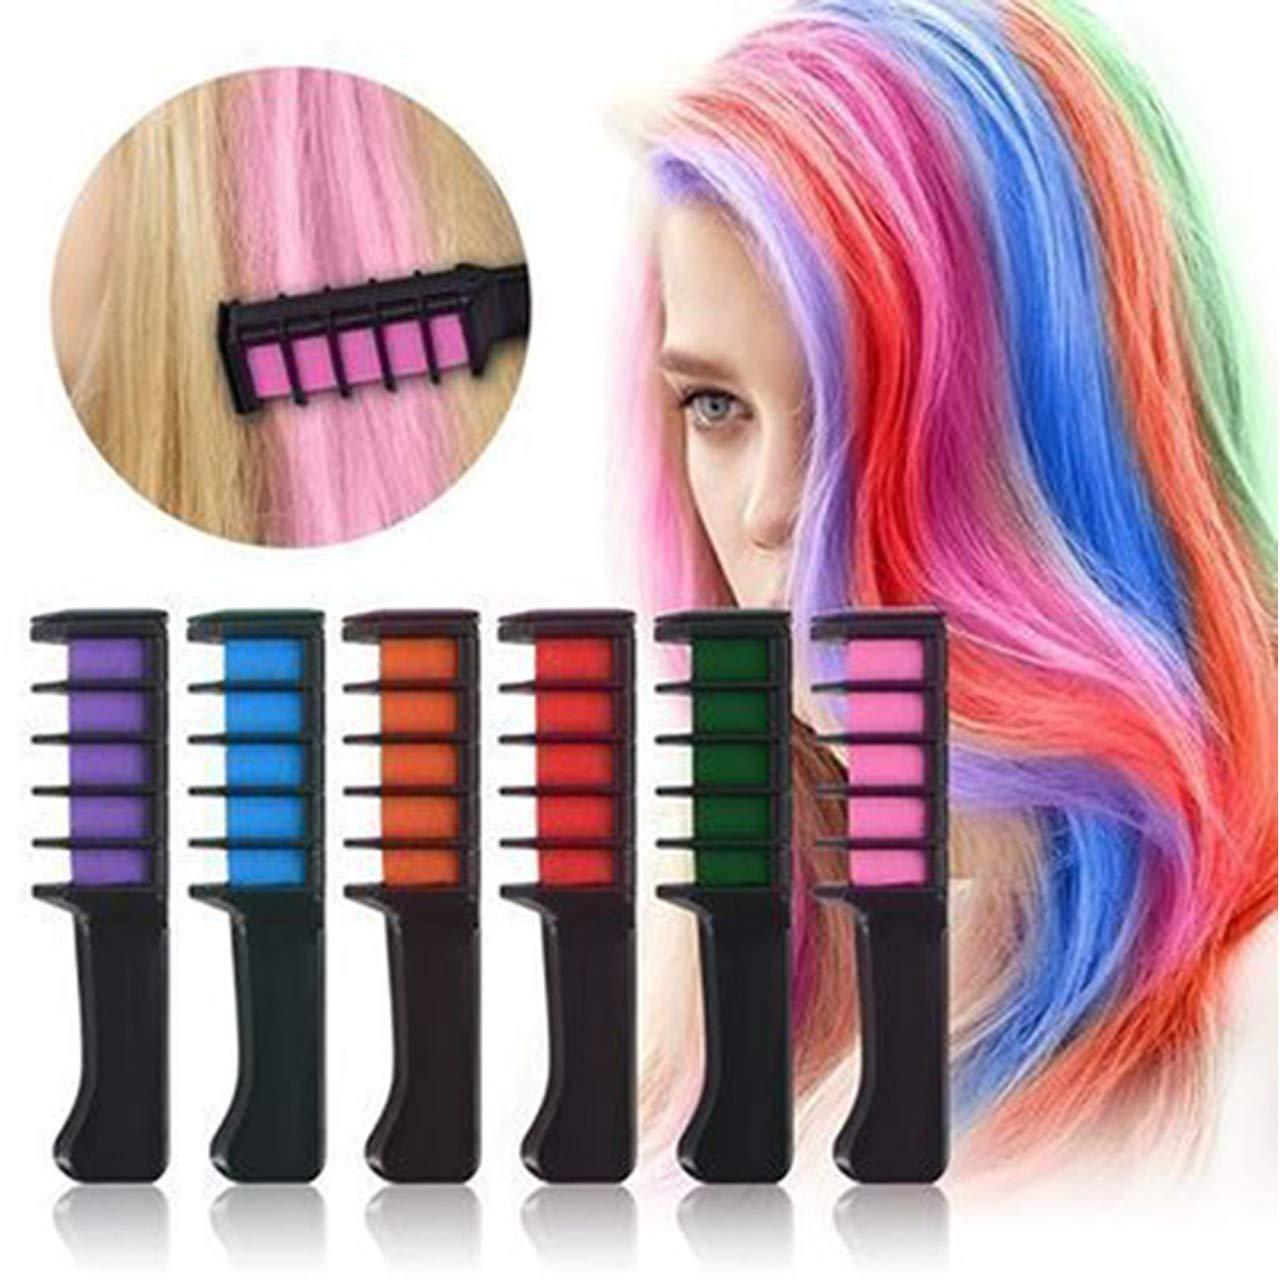 CCbeauty Hair Chalk Comb 6 Color Shimmer Long Lasting Temporary Hair Color Cream Washable Hair Dye Hair Chalk with Brush